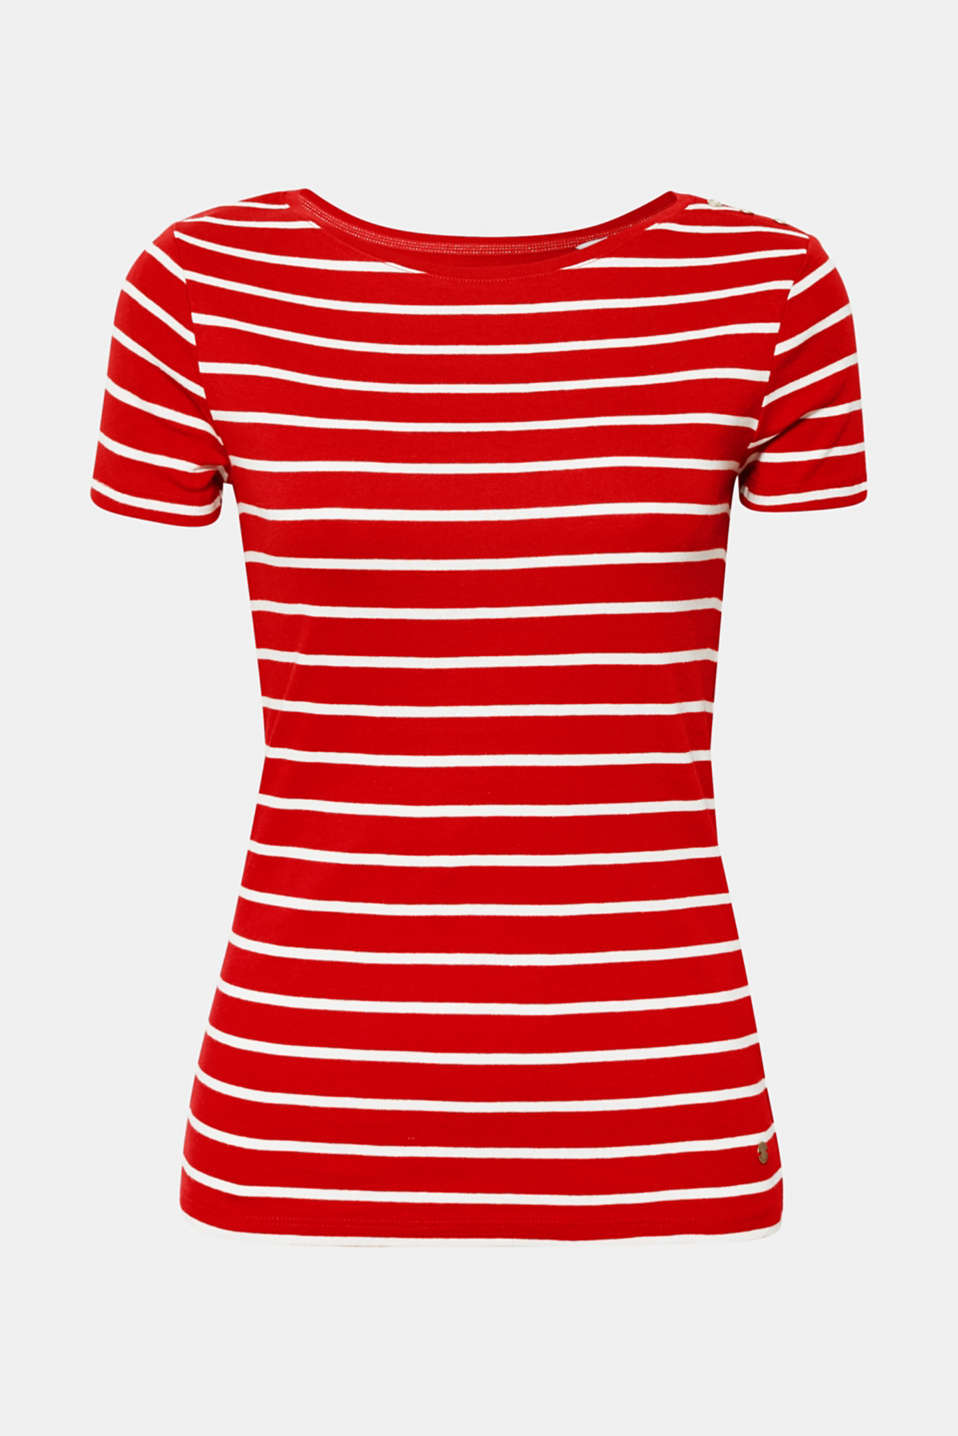 T-Shirts, DARK RED 3, detail image number 6